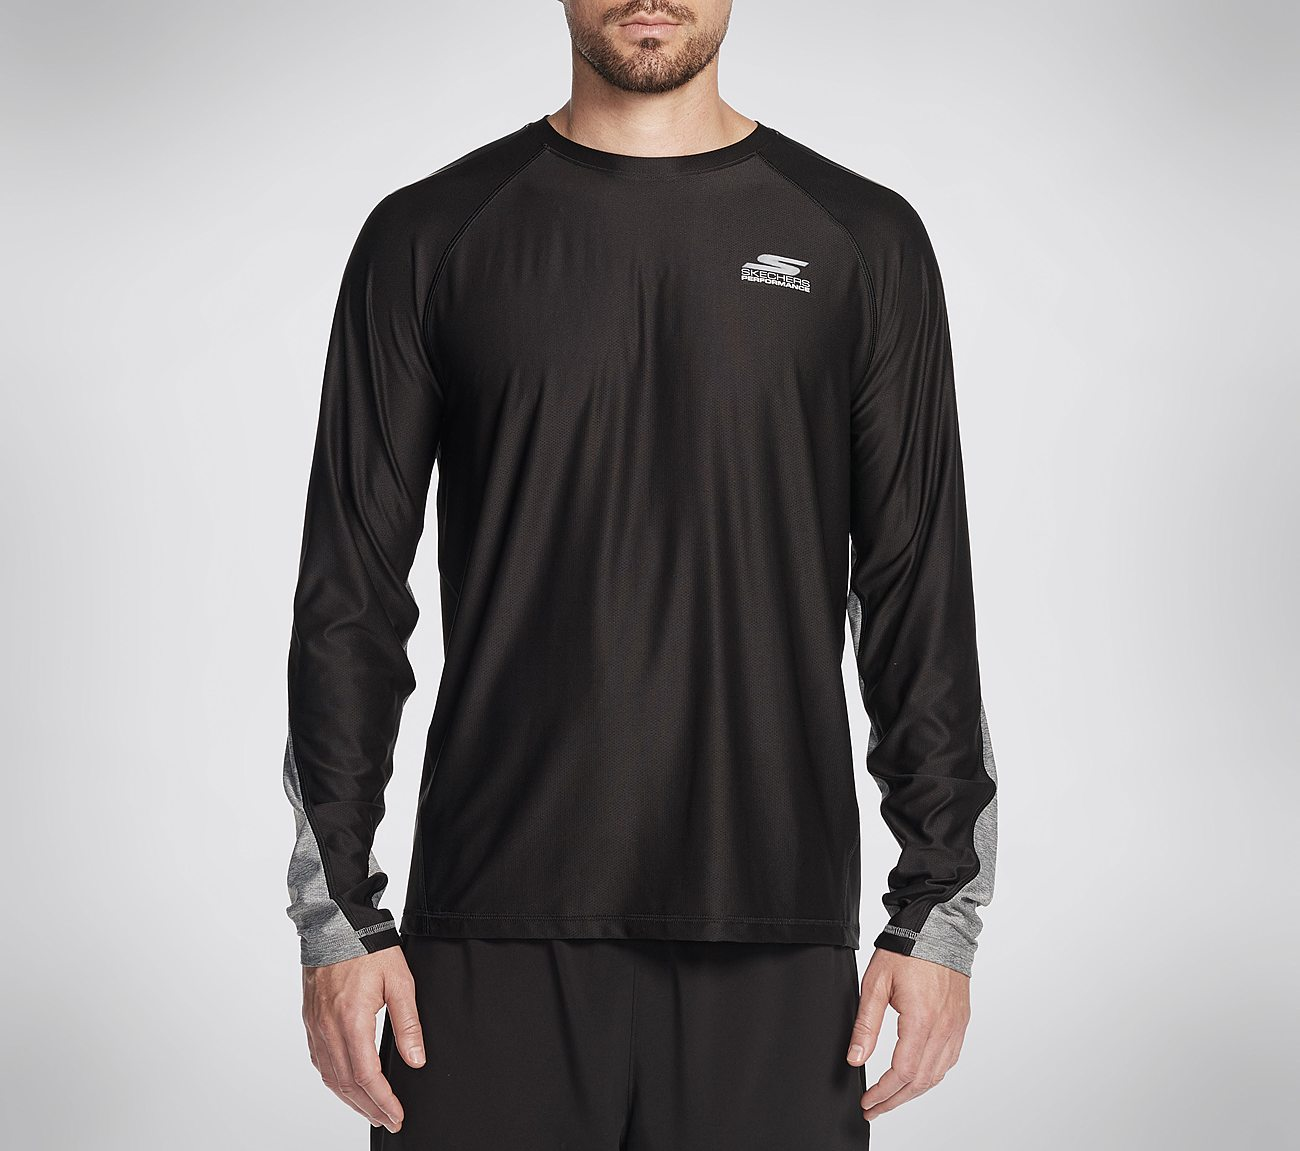 Sprint Long Sleeve Tee Shirt